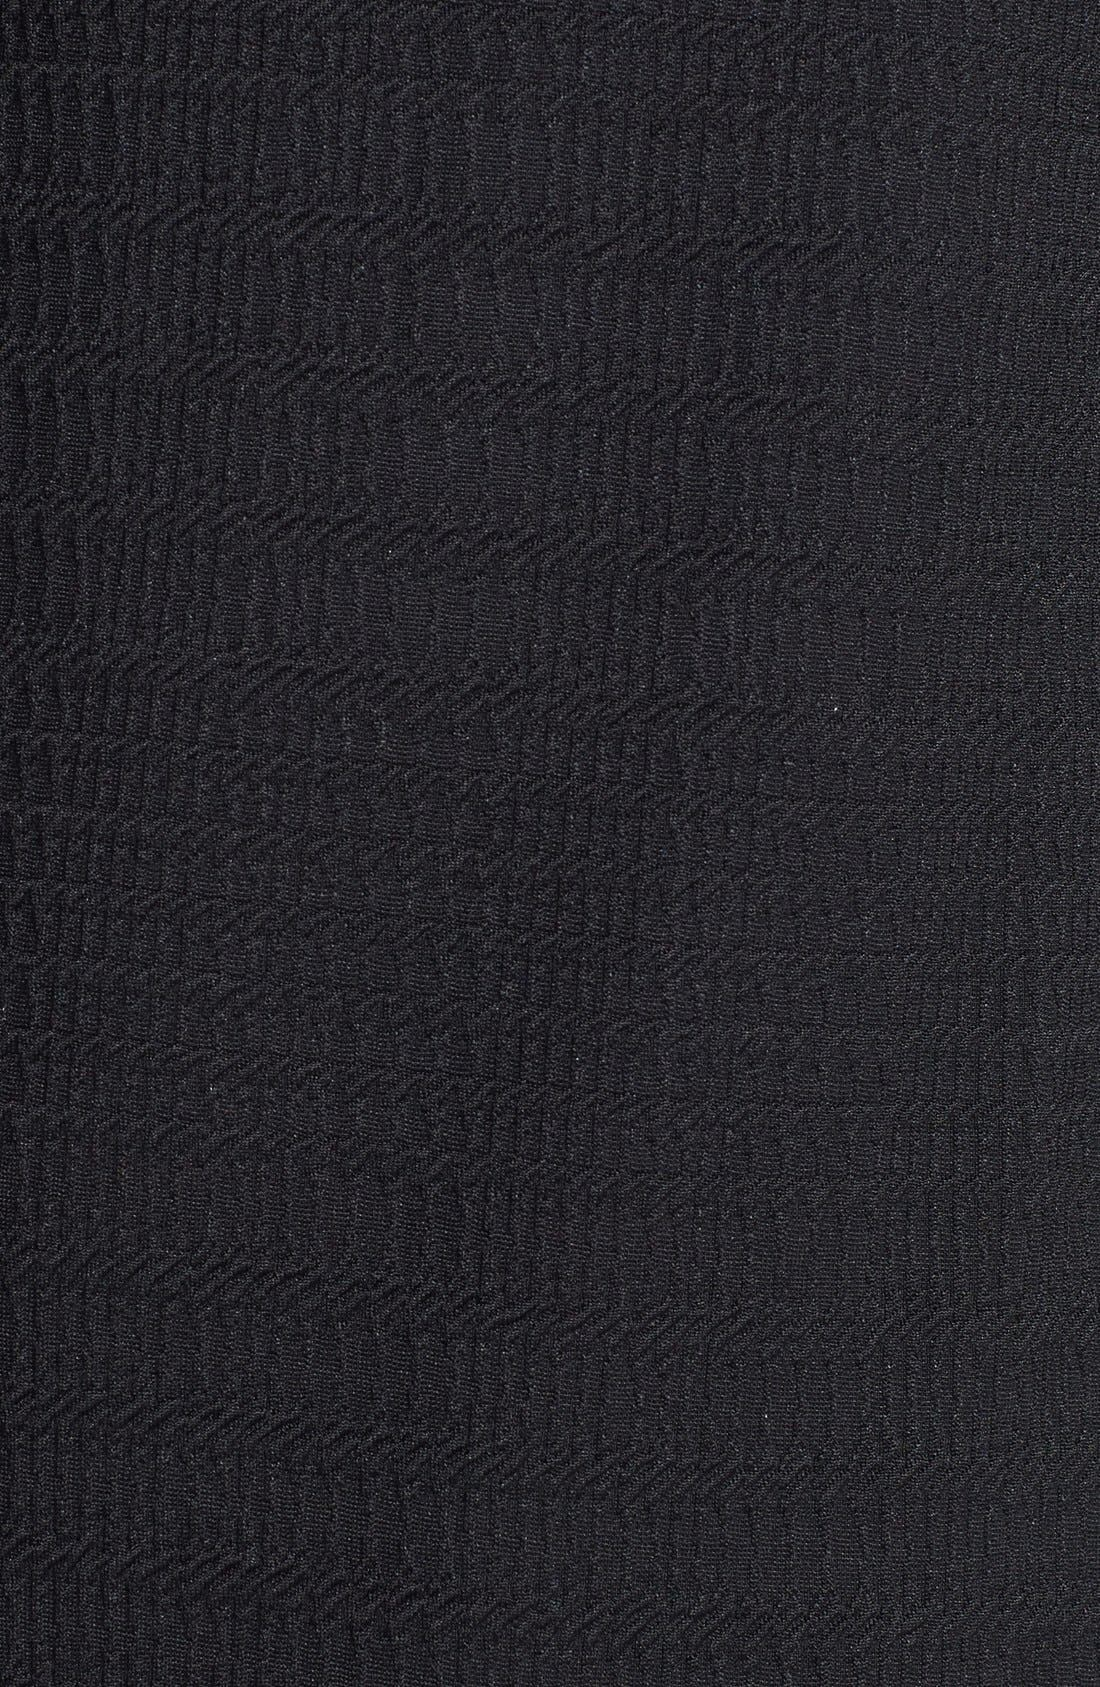 Alternate Image 3  - Sanctuary Faux Leather Sleeve Shift Dress